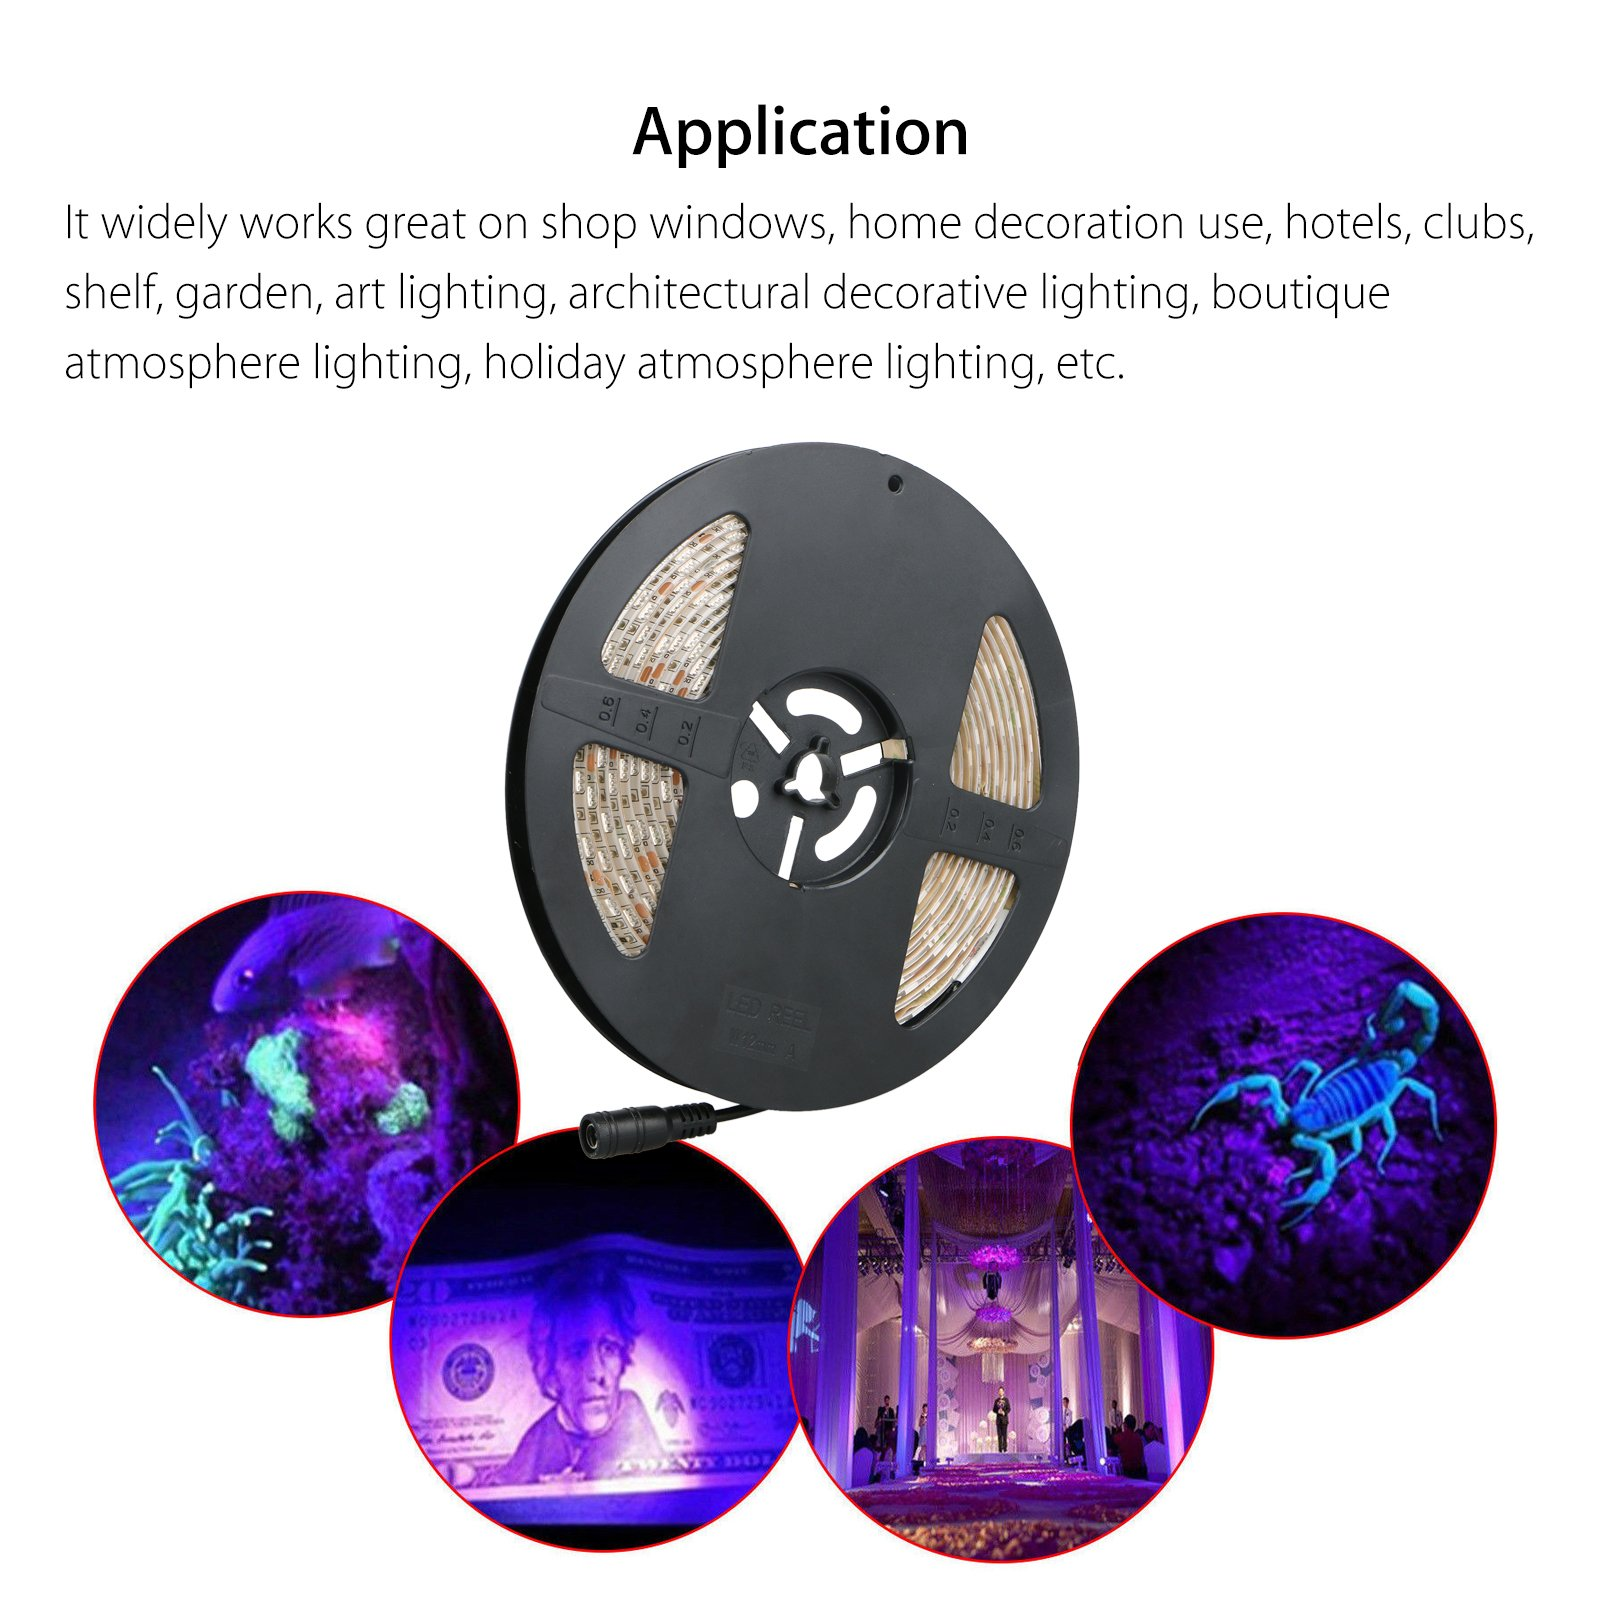 LinkStyle UV Black Lights LED Strip, 16.4Ft 300 LEDs 5050 SMD Ultraviolet Light UV LED Strip Light, Flexible & IP65 Waterproof DC 12V Purple Light Night Fishing(Power Adapter Not Included) by LinkStyle (Image #8)